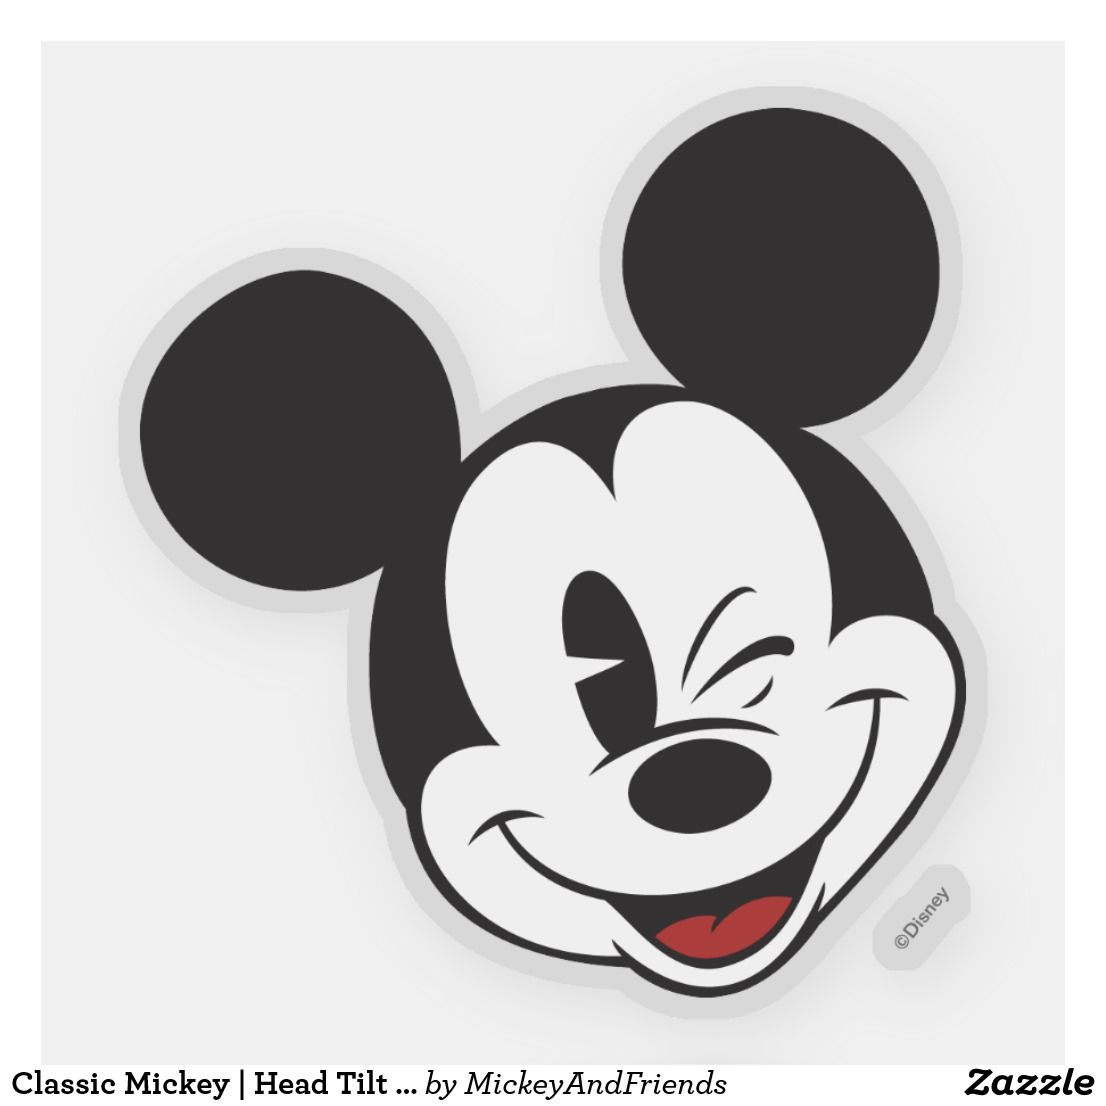 Classic Mickey Head Tilt Wink Sticker Zazzle Com Mickey Mouse Stickers Mickey Mouse Art Disney Sticker [ 1106 x 1106 Pixel ]